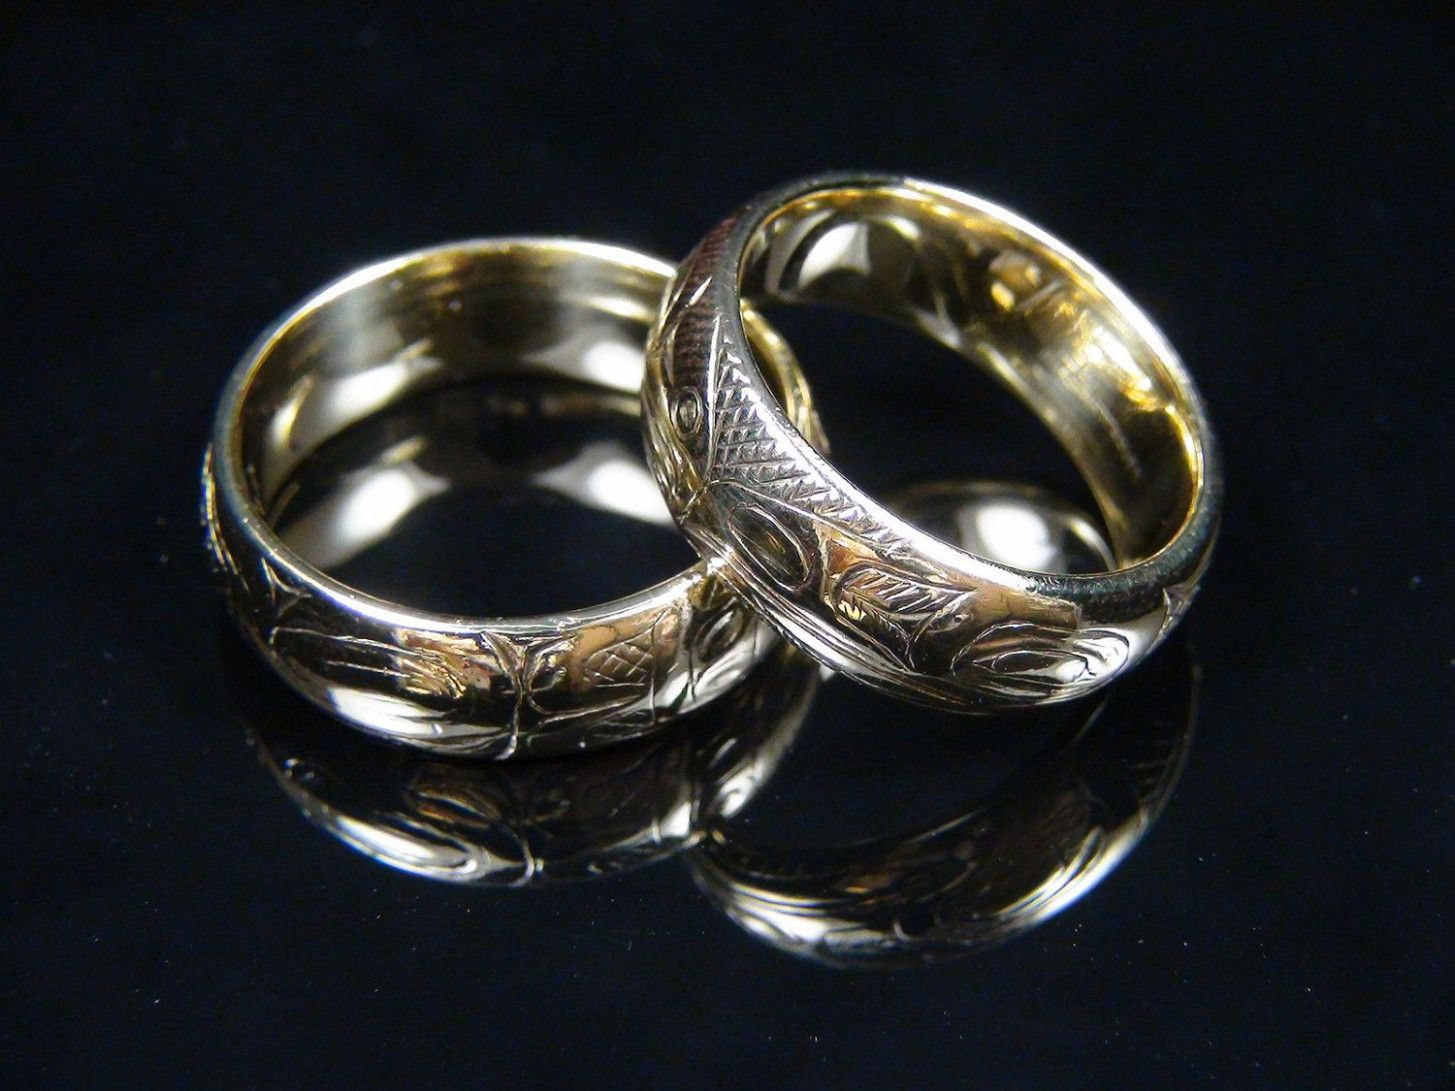 Totem Carving Matching Wedding Bands Hand Carved Warren Peele Vintage 18k Yellow Gold Indianwedding Ringsnativeamerican: Native American Wedding Ring Designs At Websimilar.org